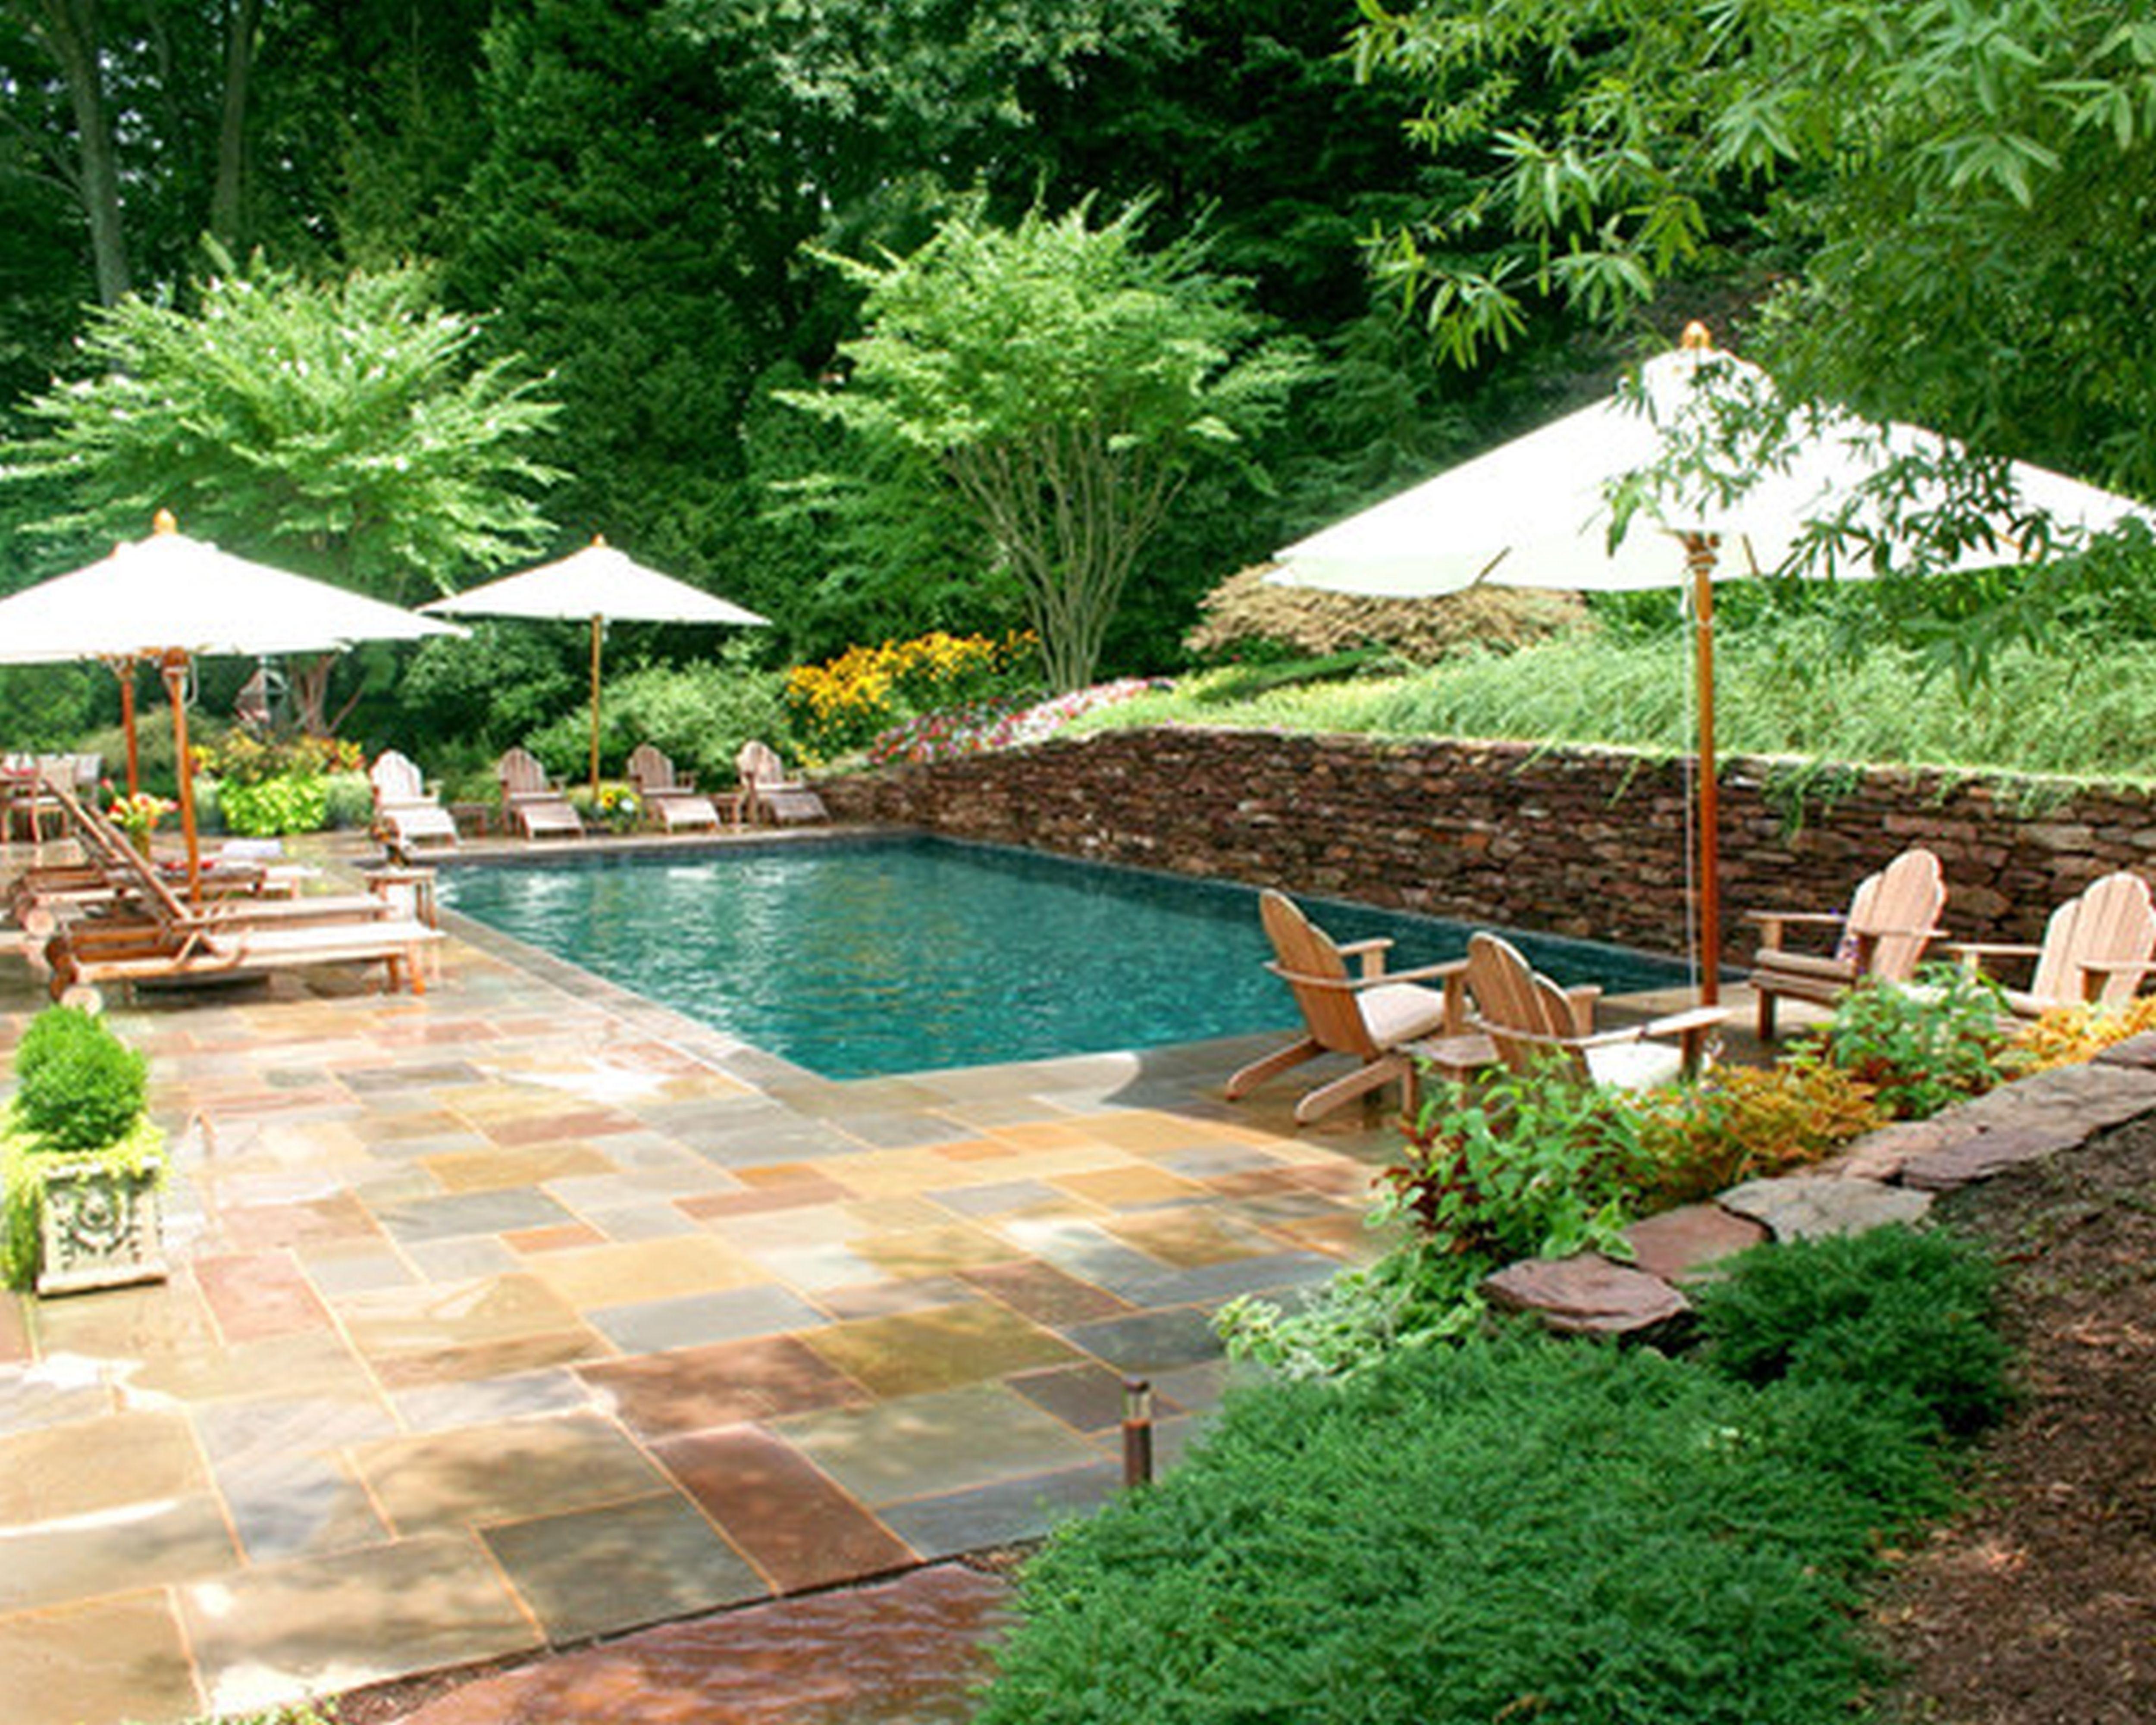 Small Backyard Pool Ideas Small backyard pools, Swimming